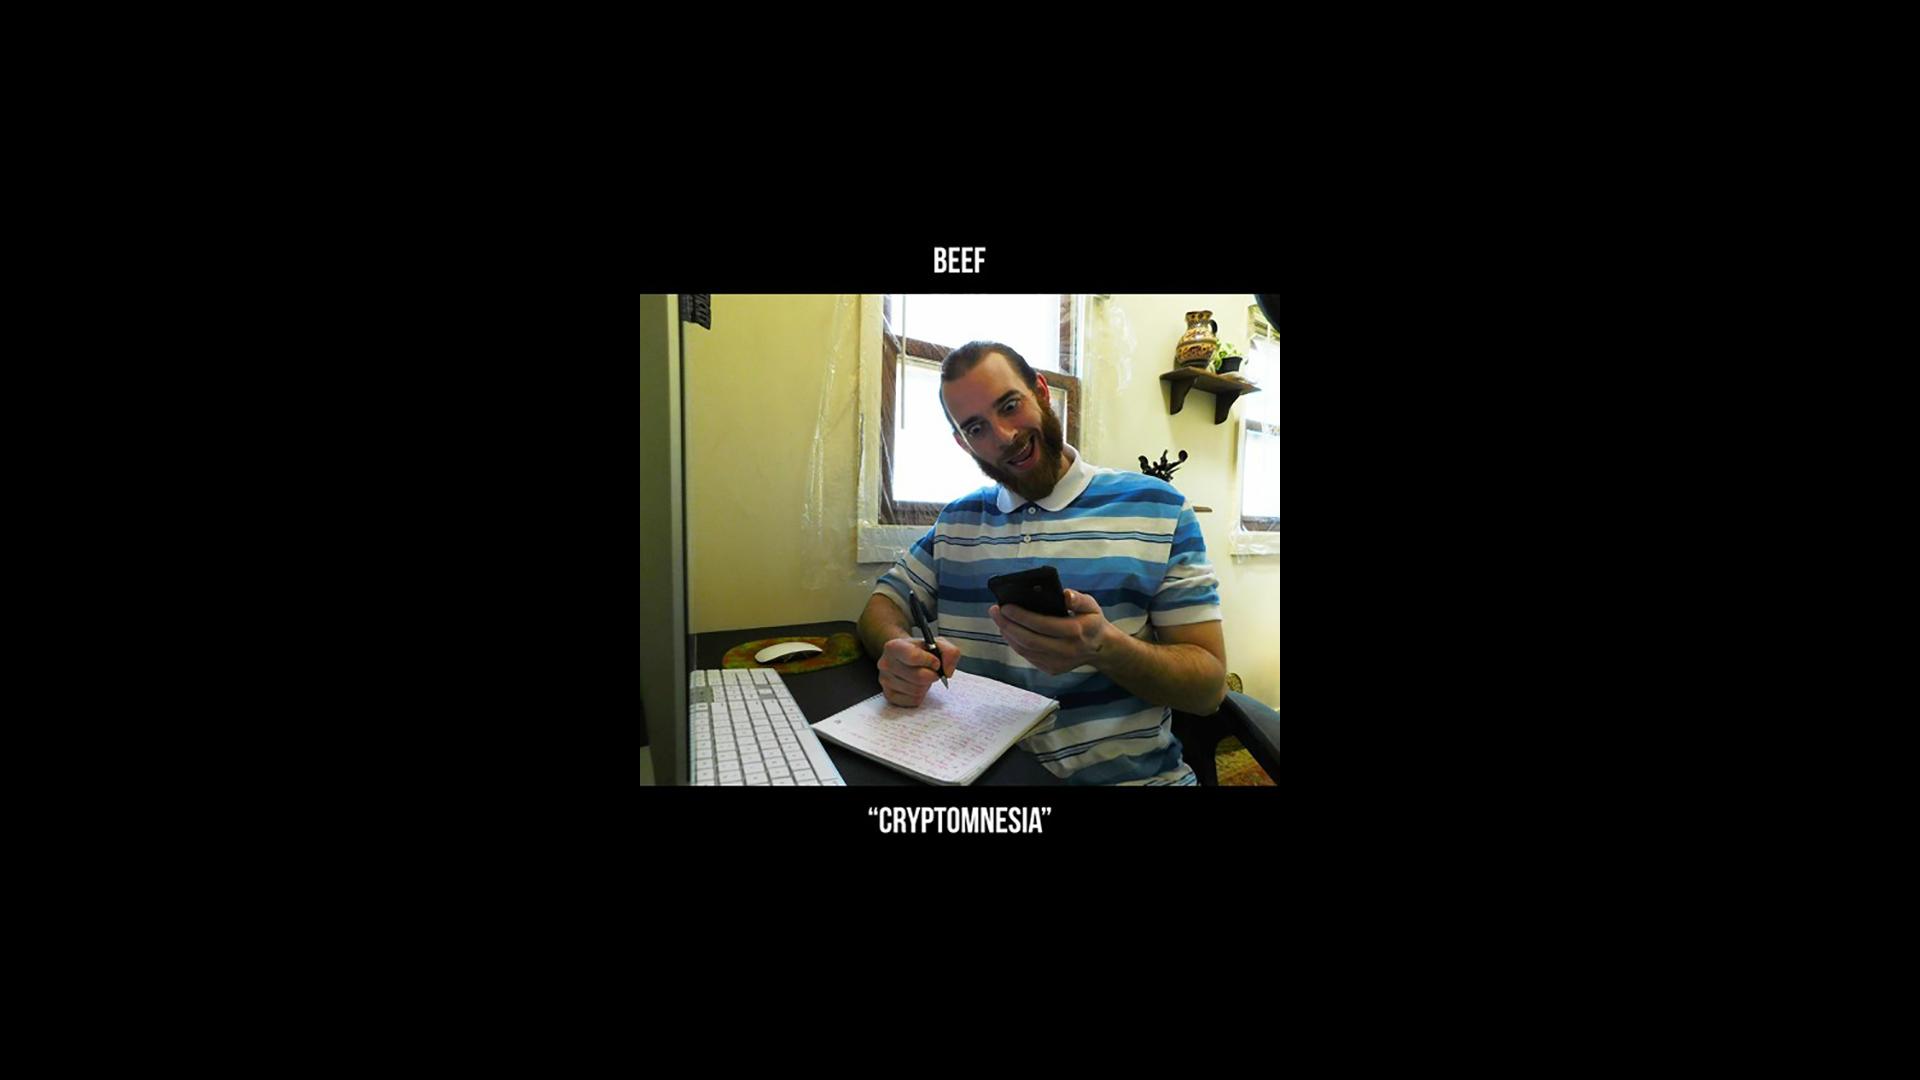 beef-cryptomnesia-basement-made-mad-tape-mixtape-album